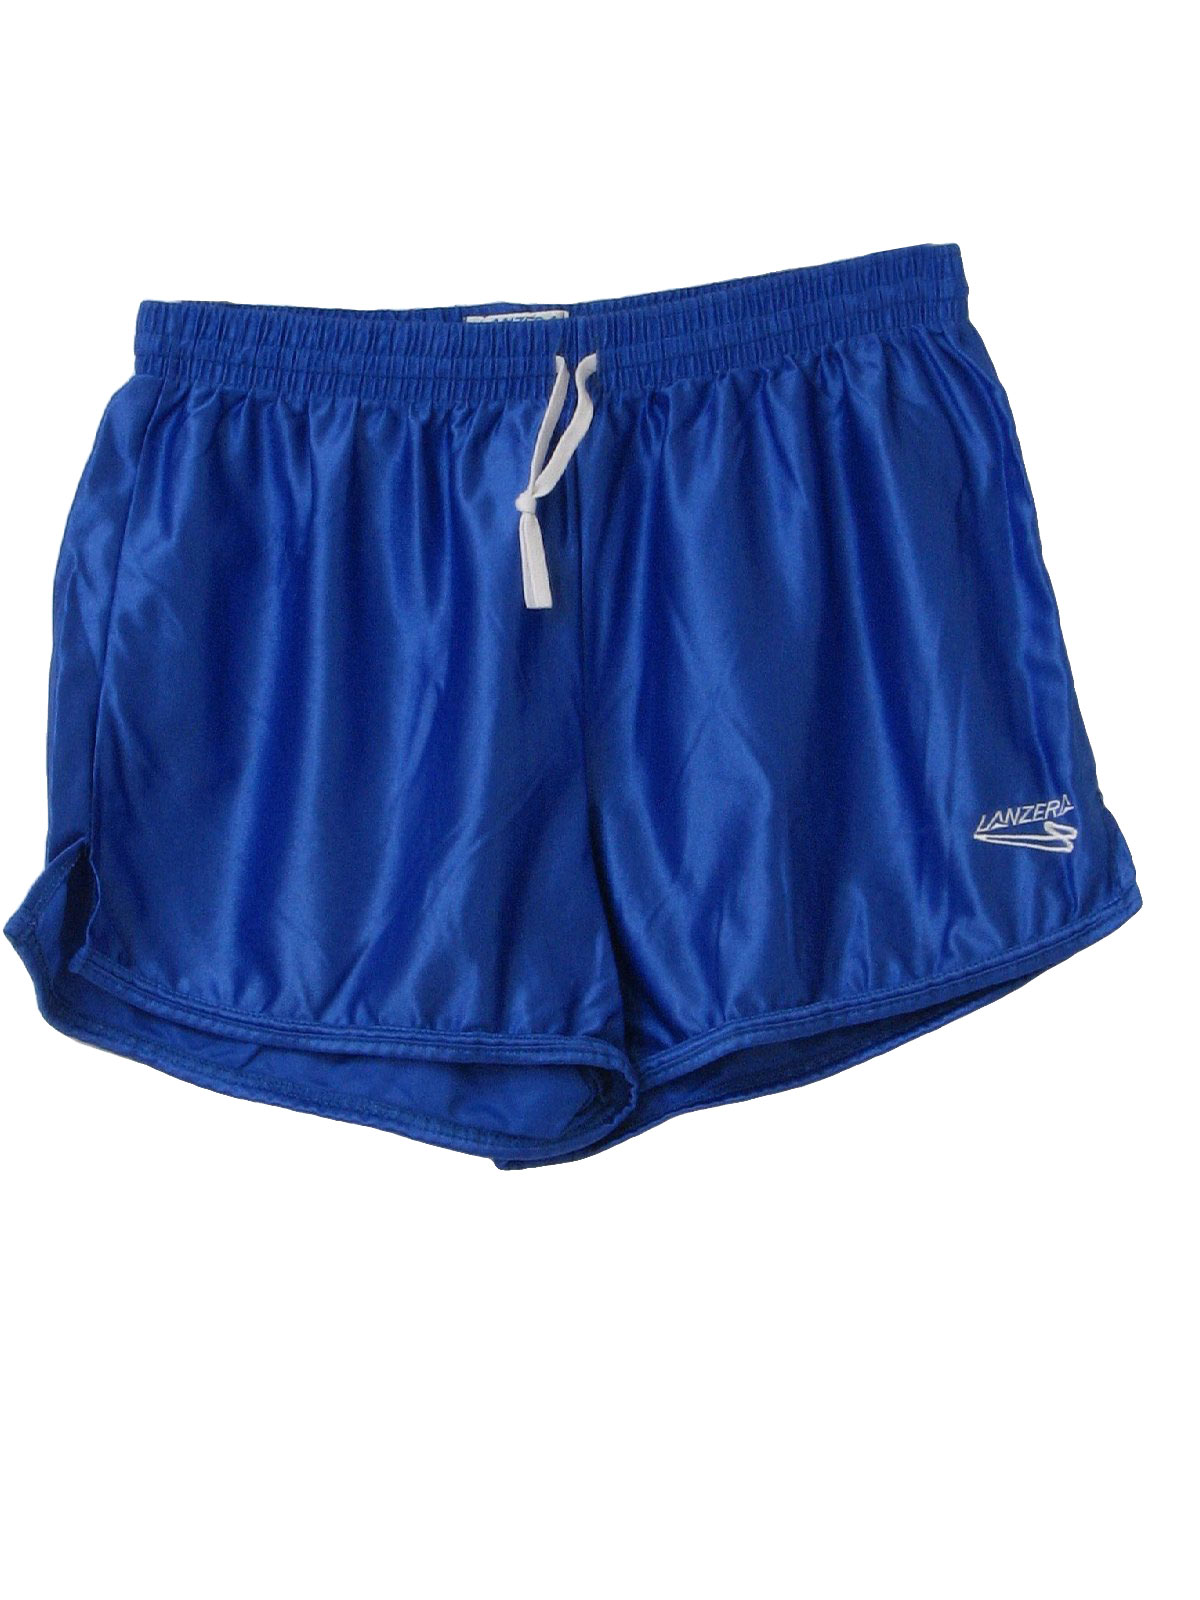 Nylon Men S Shorts 47